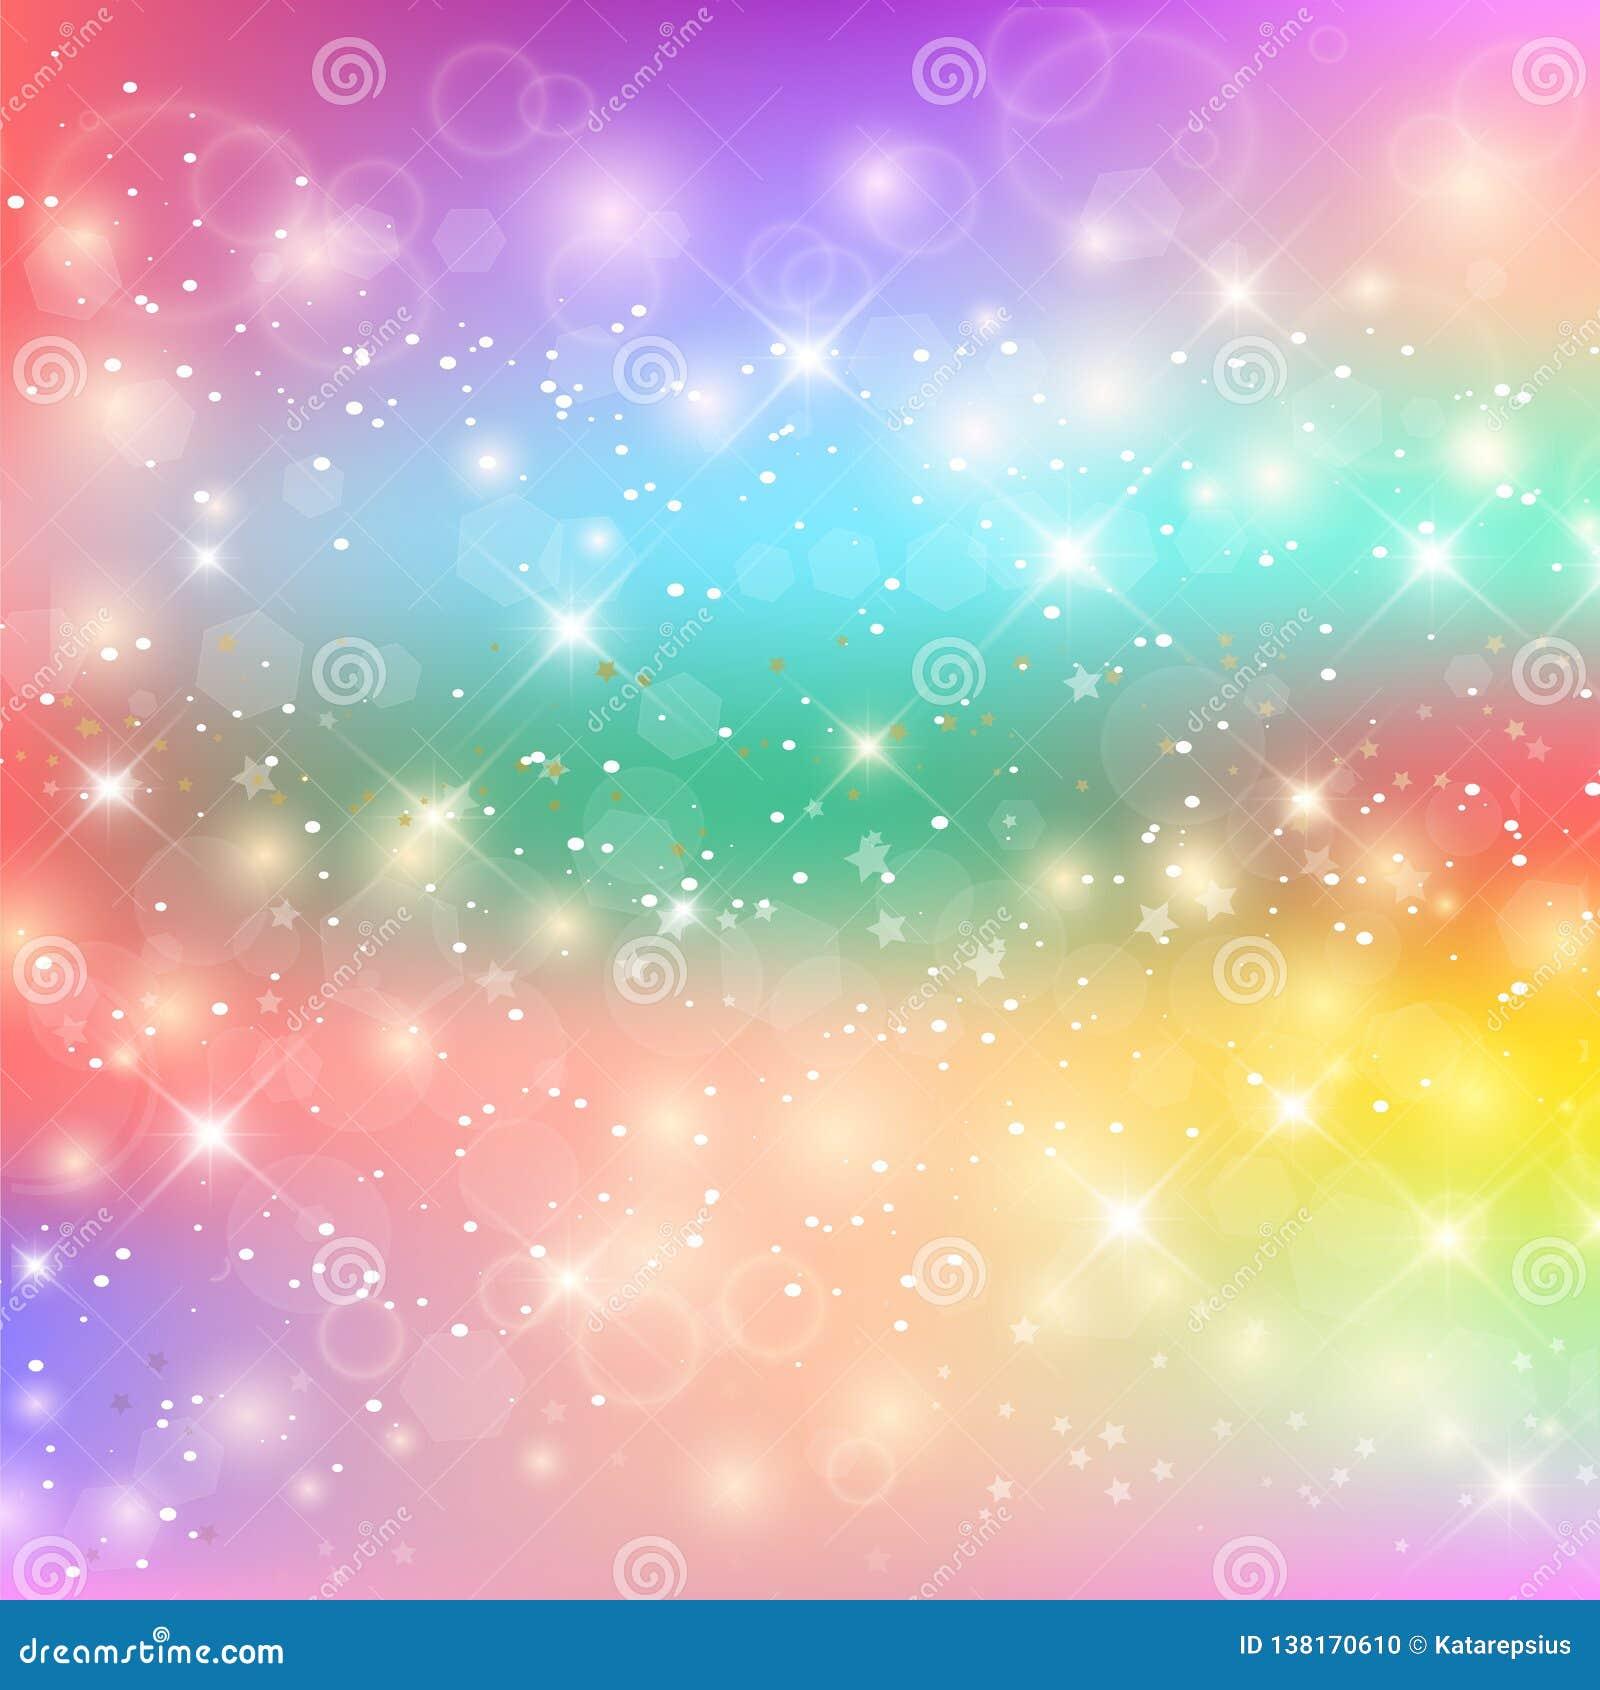 Kawaii Baby Unicorn Background With Glowing Stars Stock ...